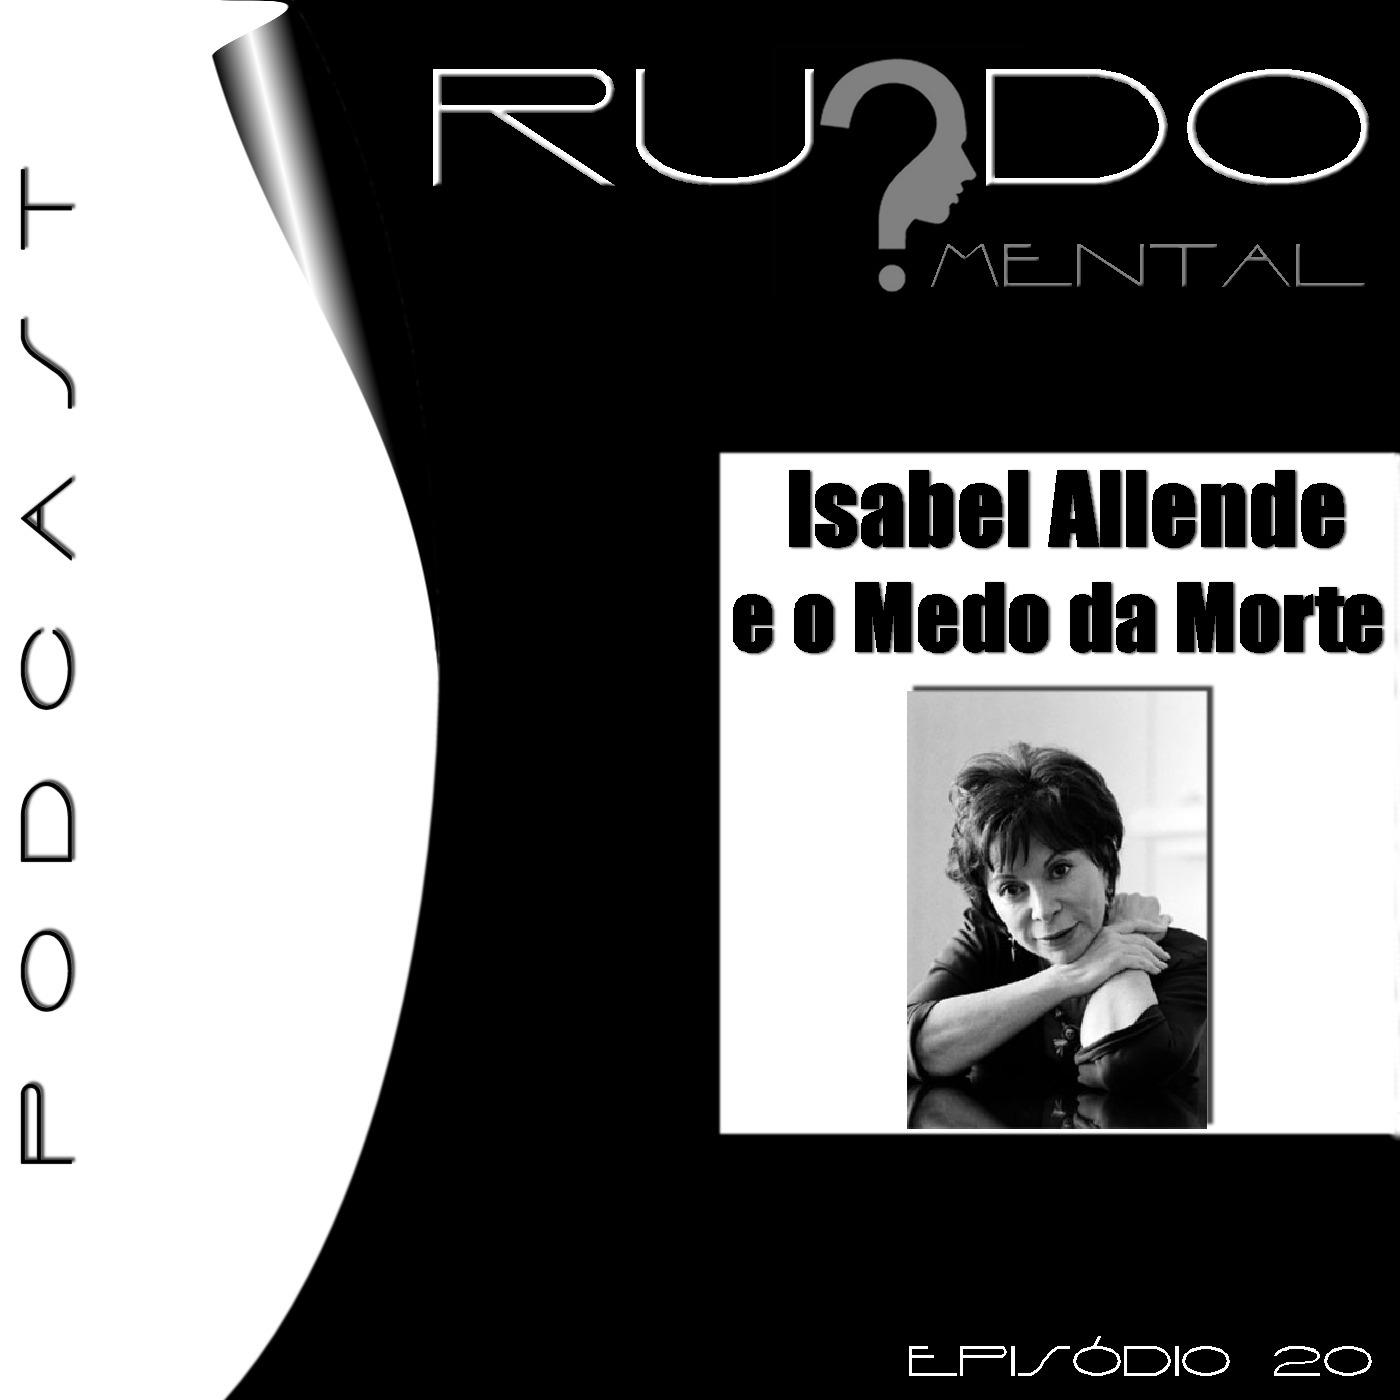 # 20 - Isabel Allende e o Medo da Morte